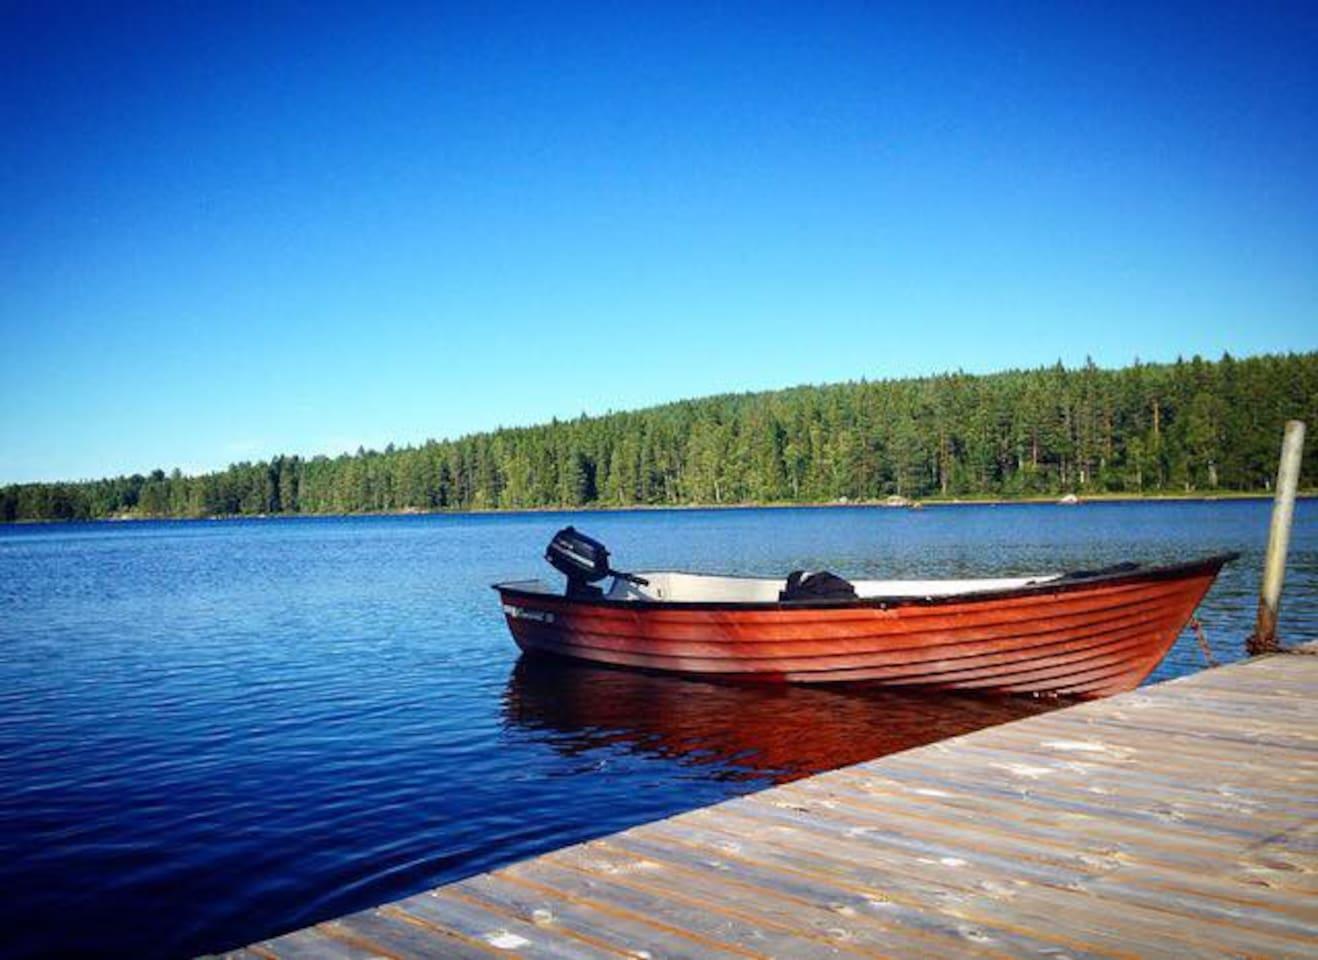 TM Gården: Escape and Explore in Sweden